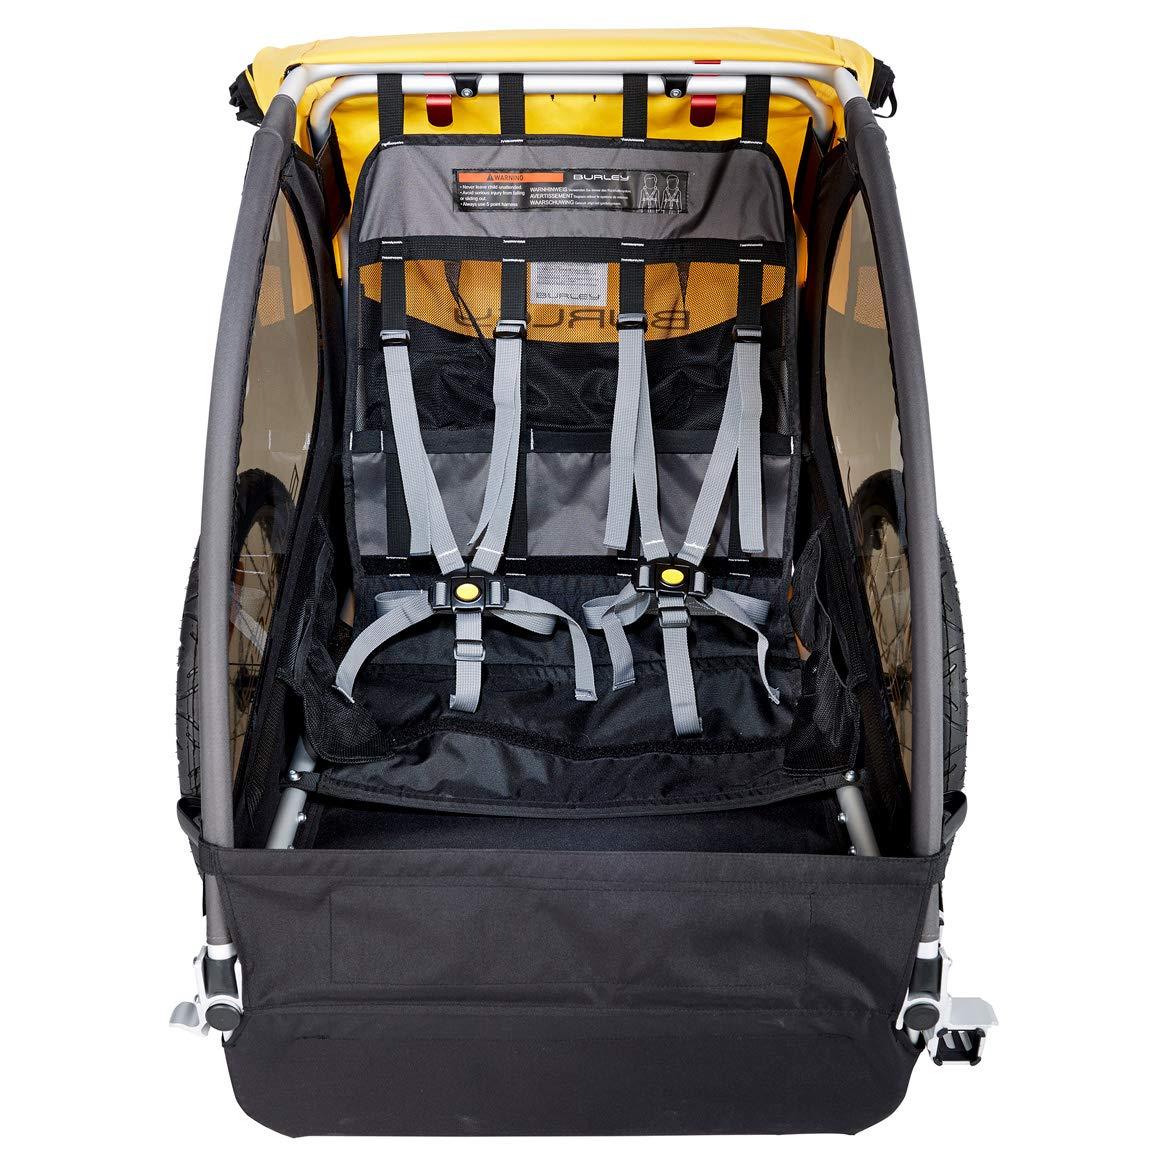 e94aa156c0 Amazon.com : Burley Bee, 2 Seat Kids Bike Trailer : Sports & Outdoors